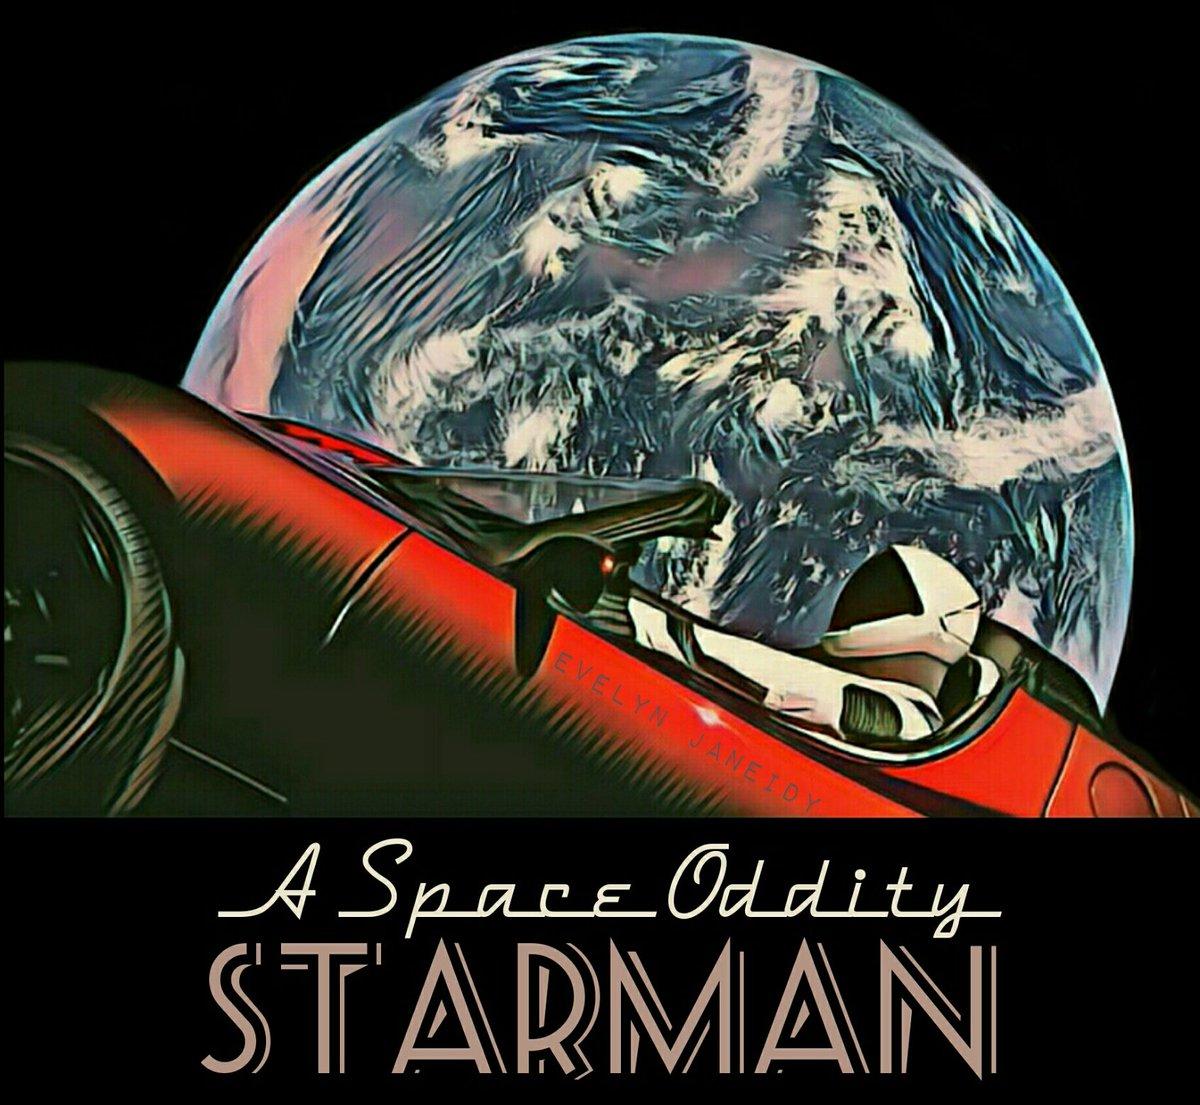 @elonmusk #SpaceX #Tesla My depiction of Starman 👽 ••• Happy Birthday Musk •••